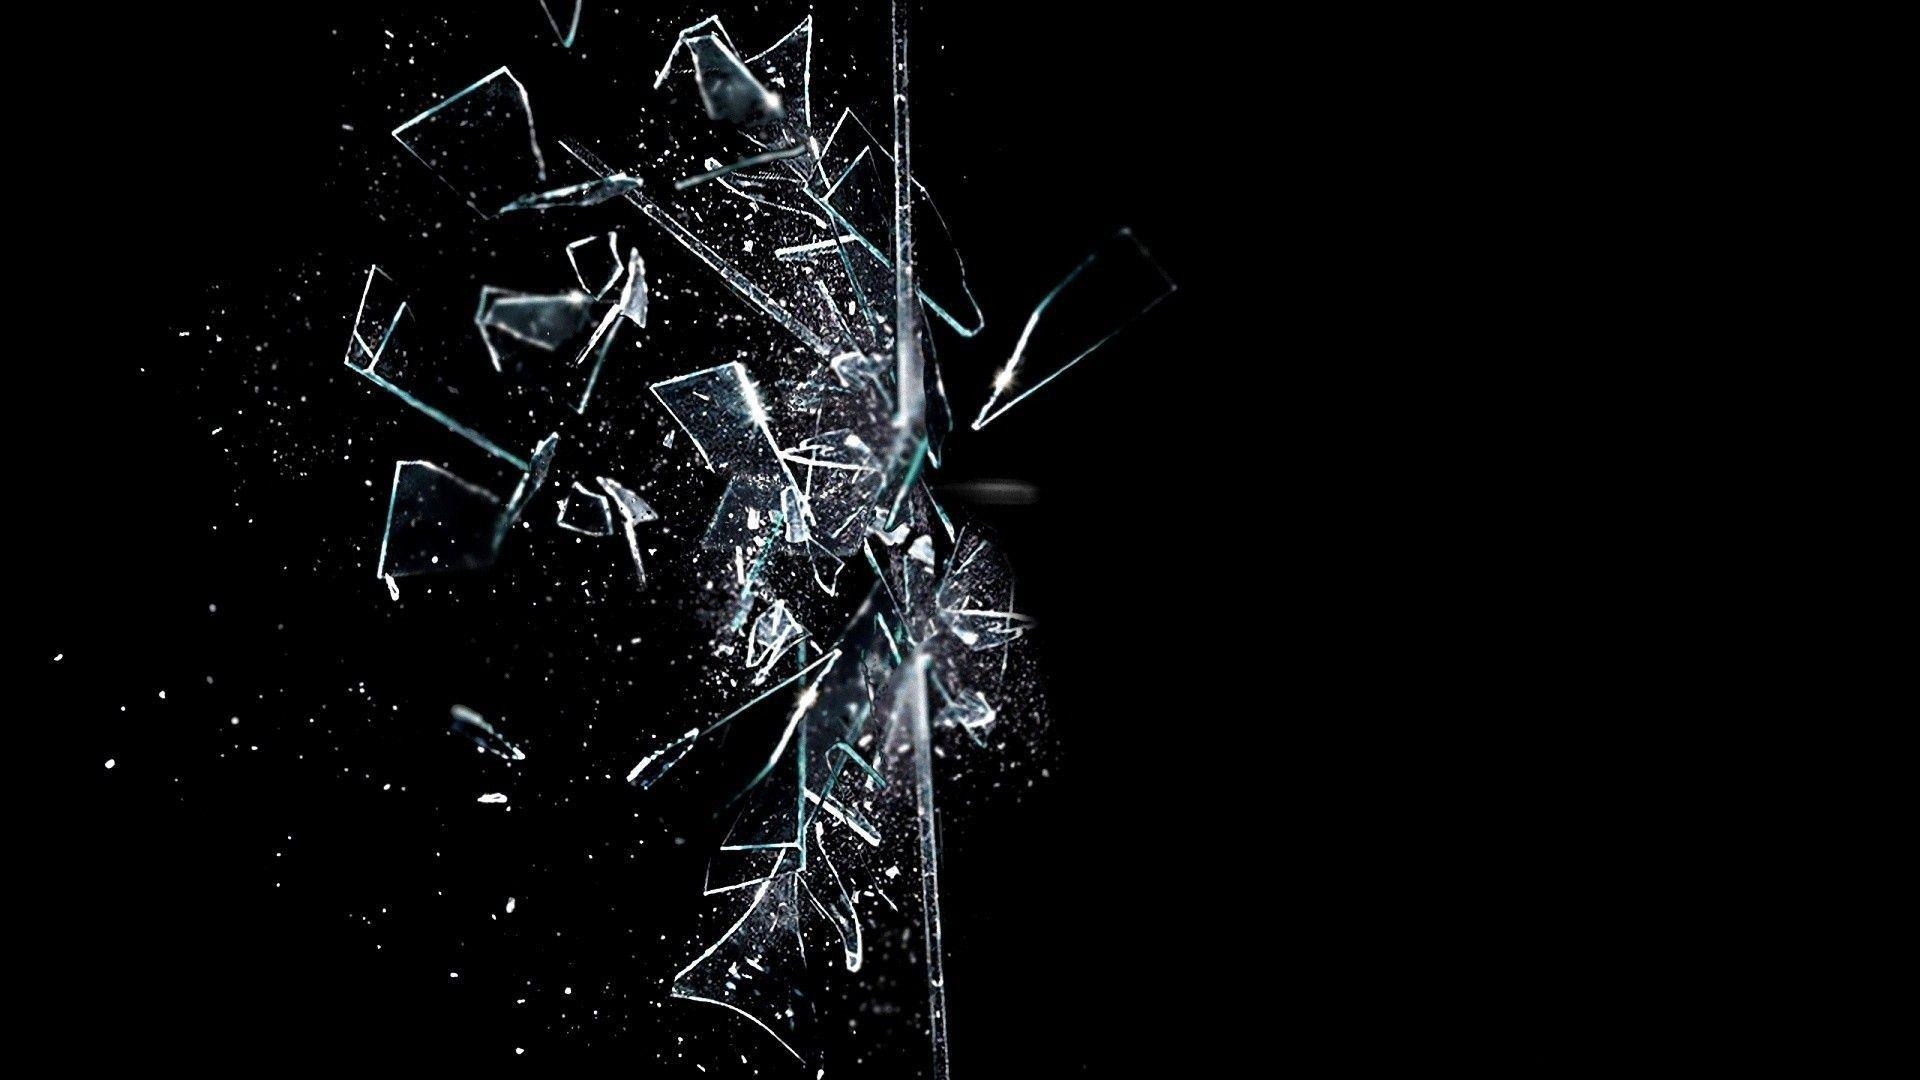 broken screen wallpapers for apple iphone , and best 750×1334